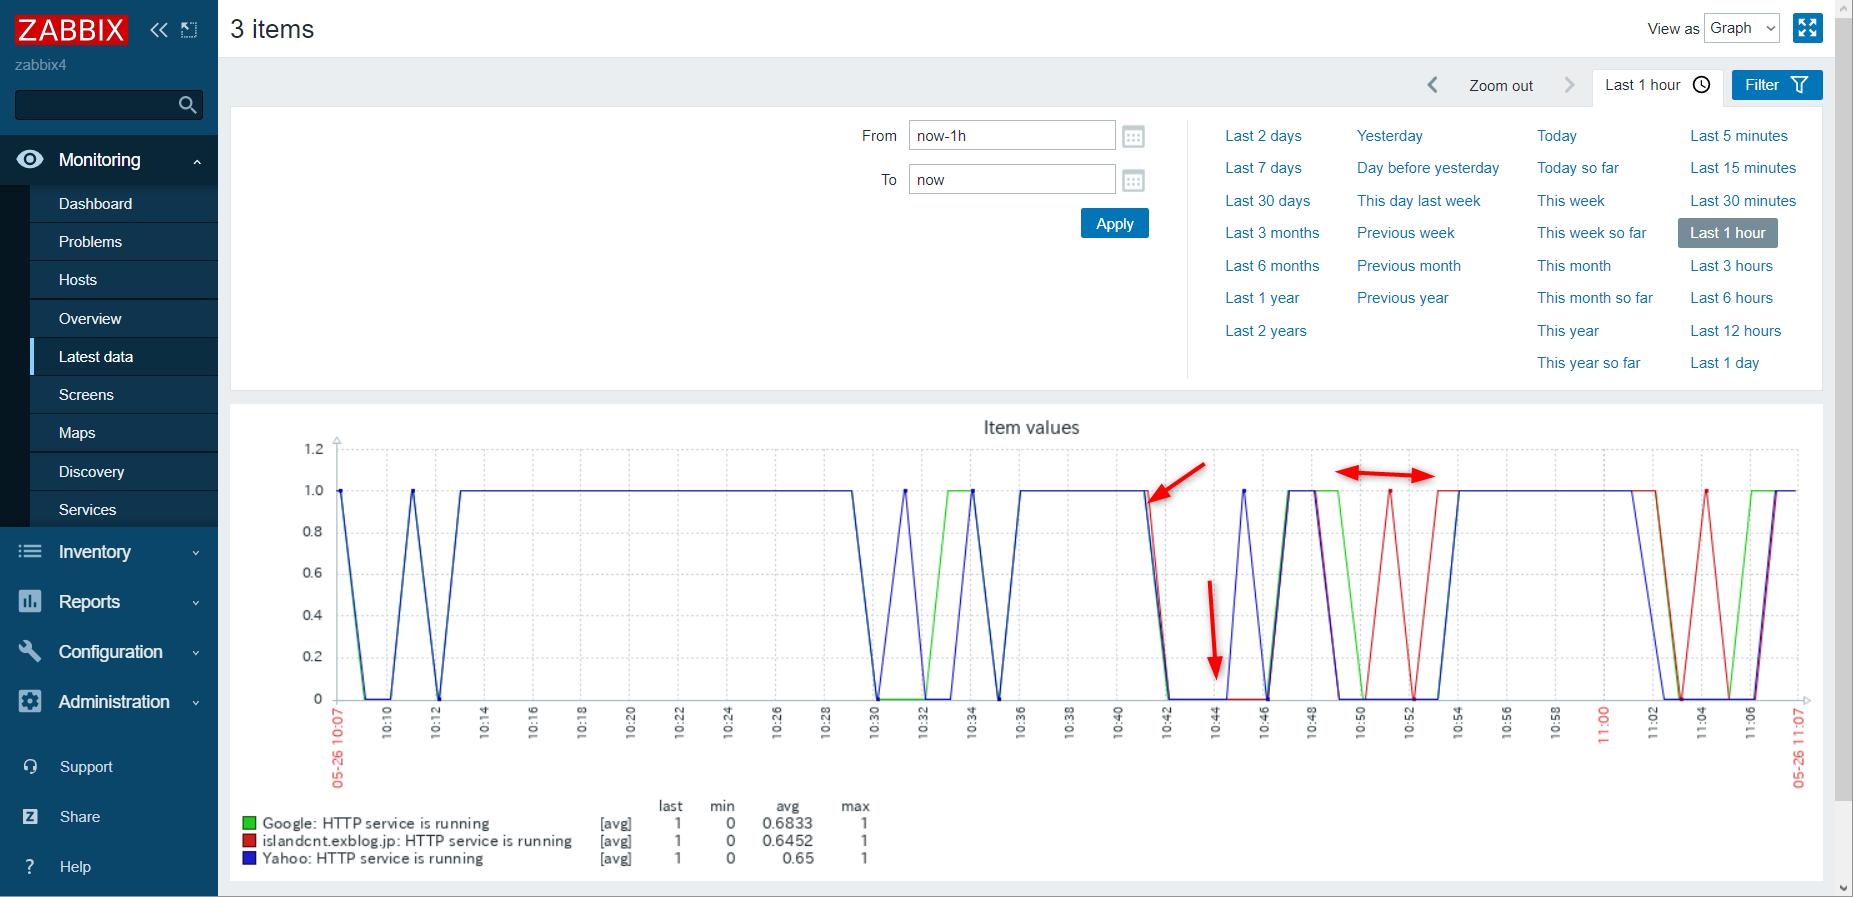 zabbix5 でインターネットの疎通、監視、リモートワーク時代の「ネットが遅い」をチェック_a0056607_12252509.png